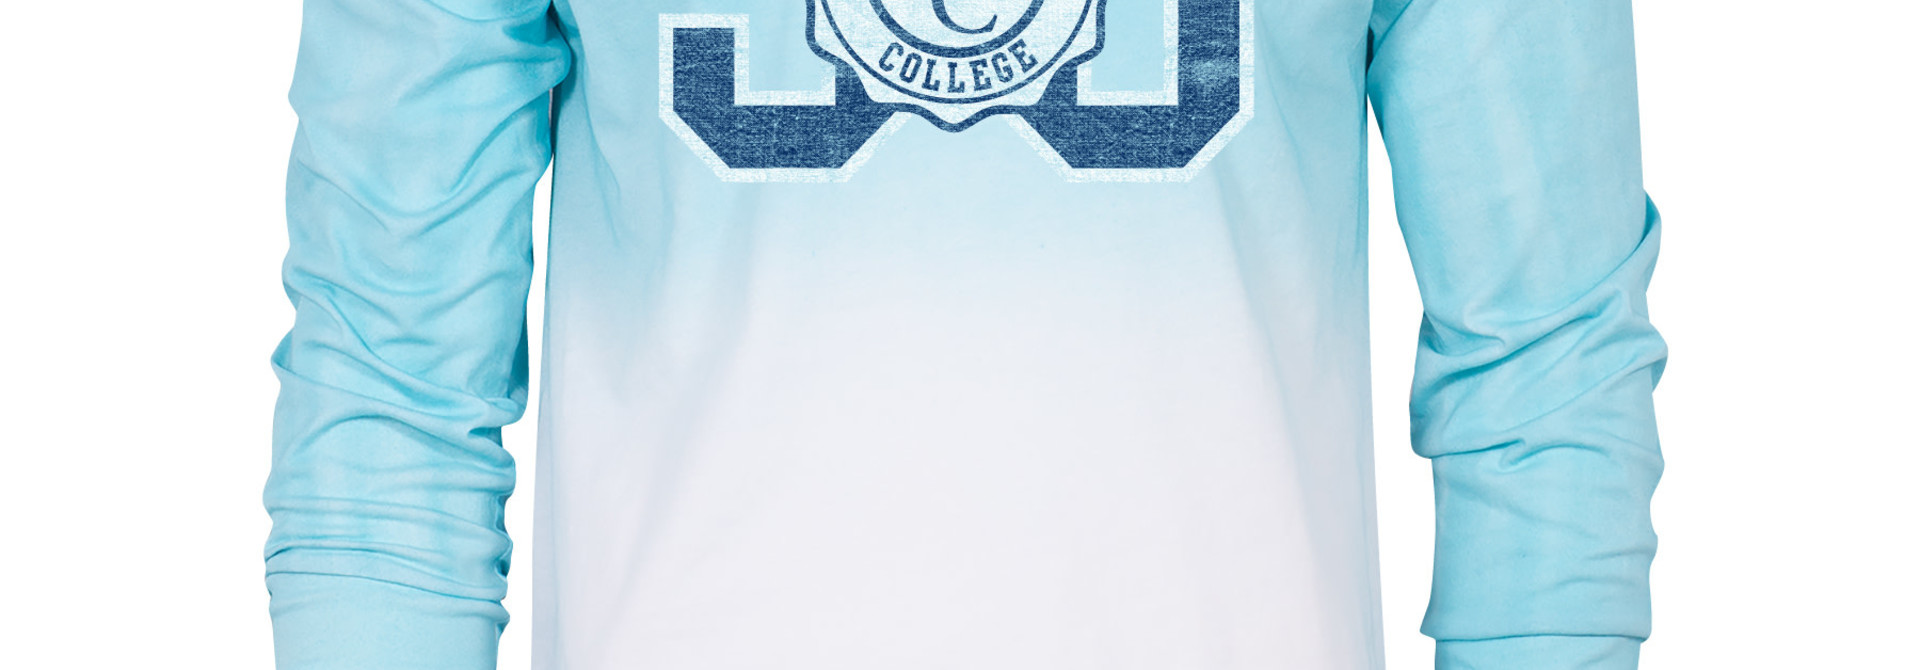 55 Berea College Dip-Dyed T-Shirt